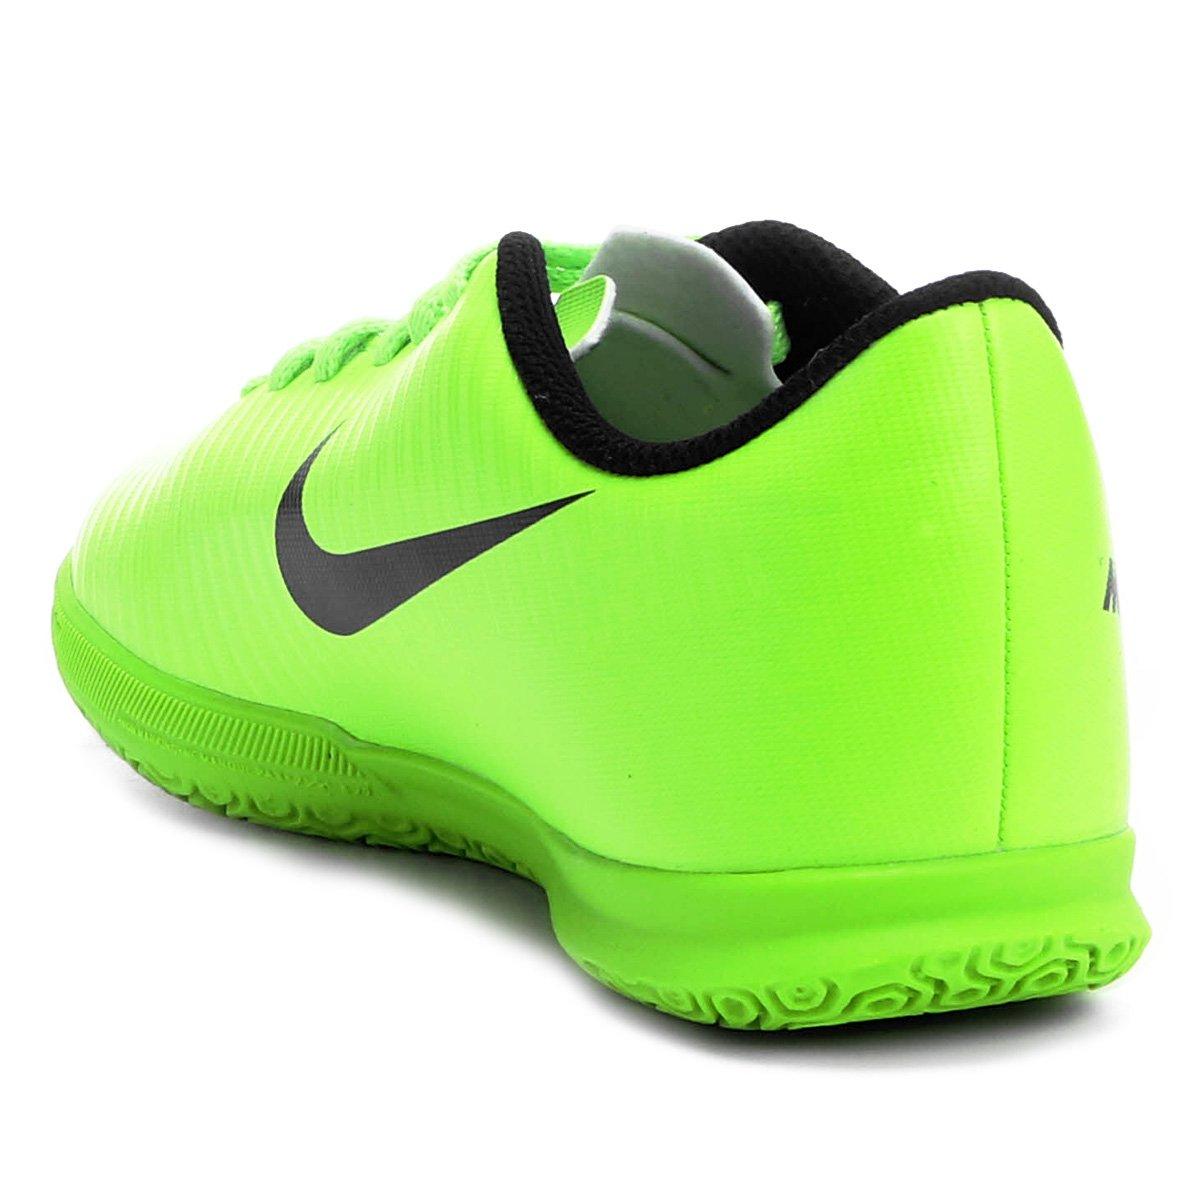 eebc2807e261d Uk Chuteira Nike Mercurial Victory V Cr Ic Infantil 4e910 8e16d